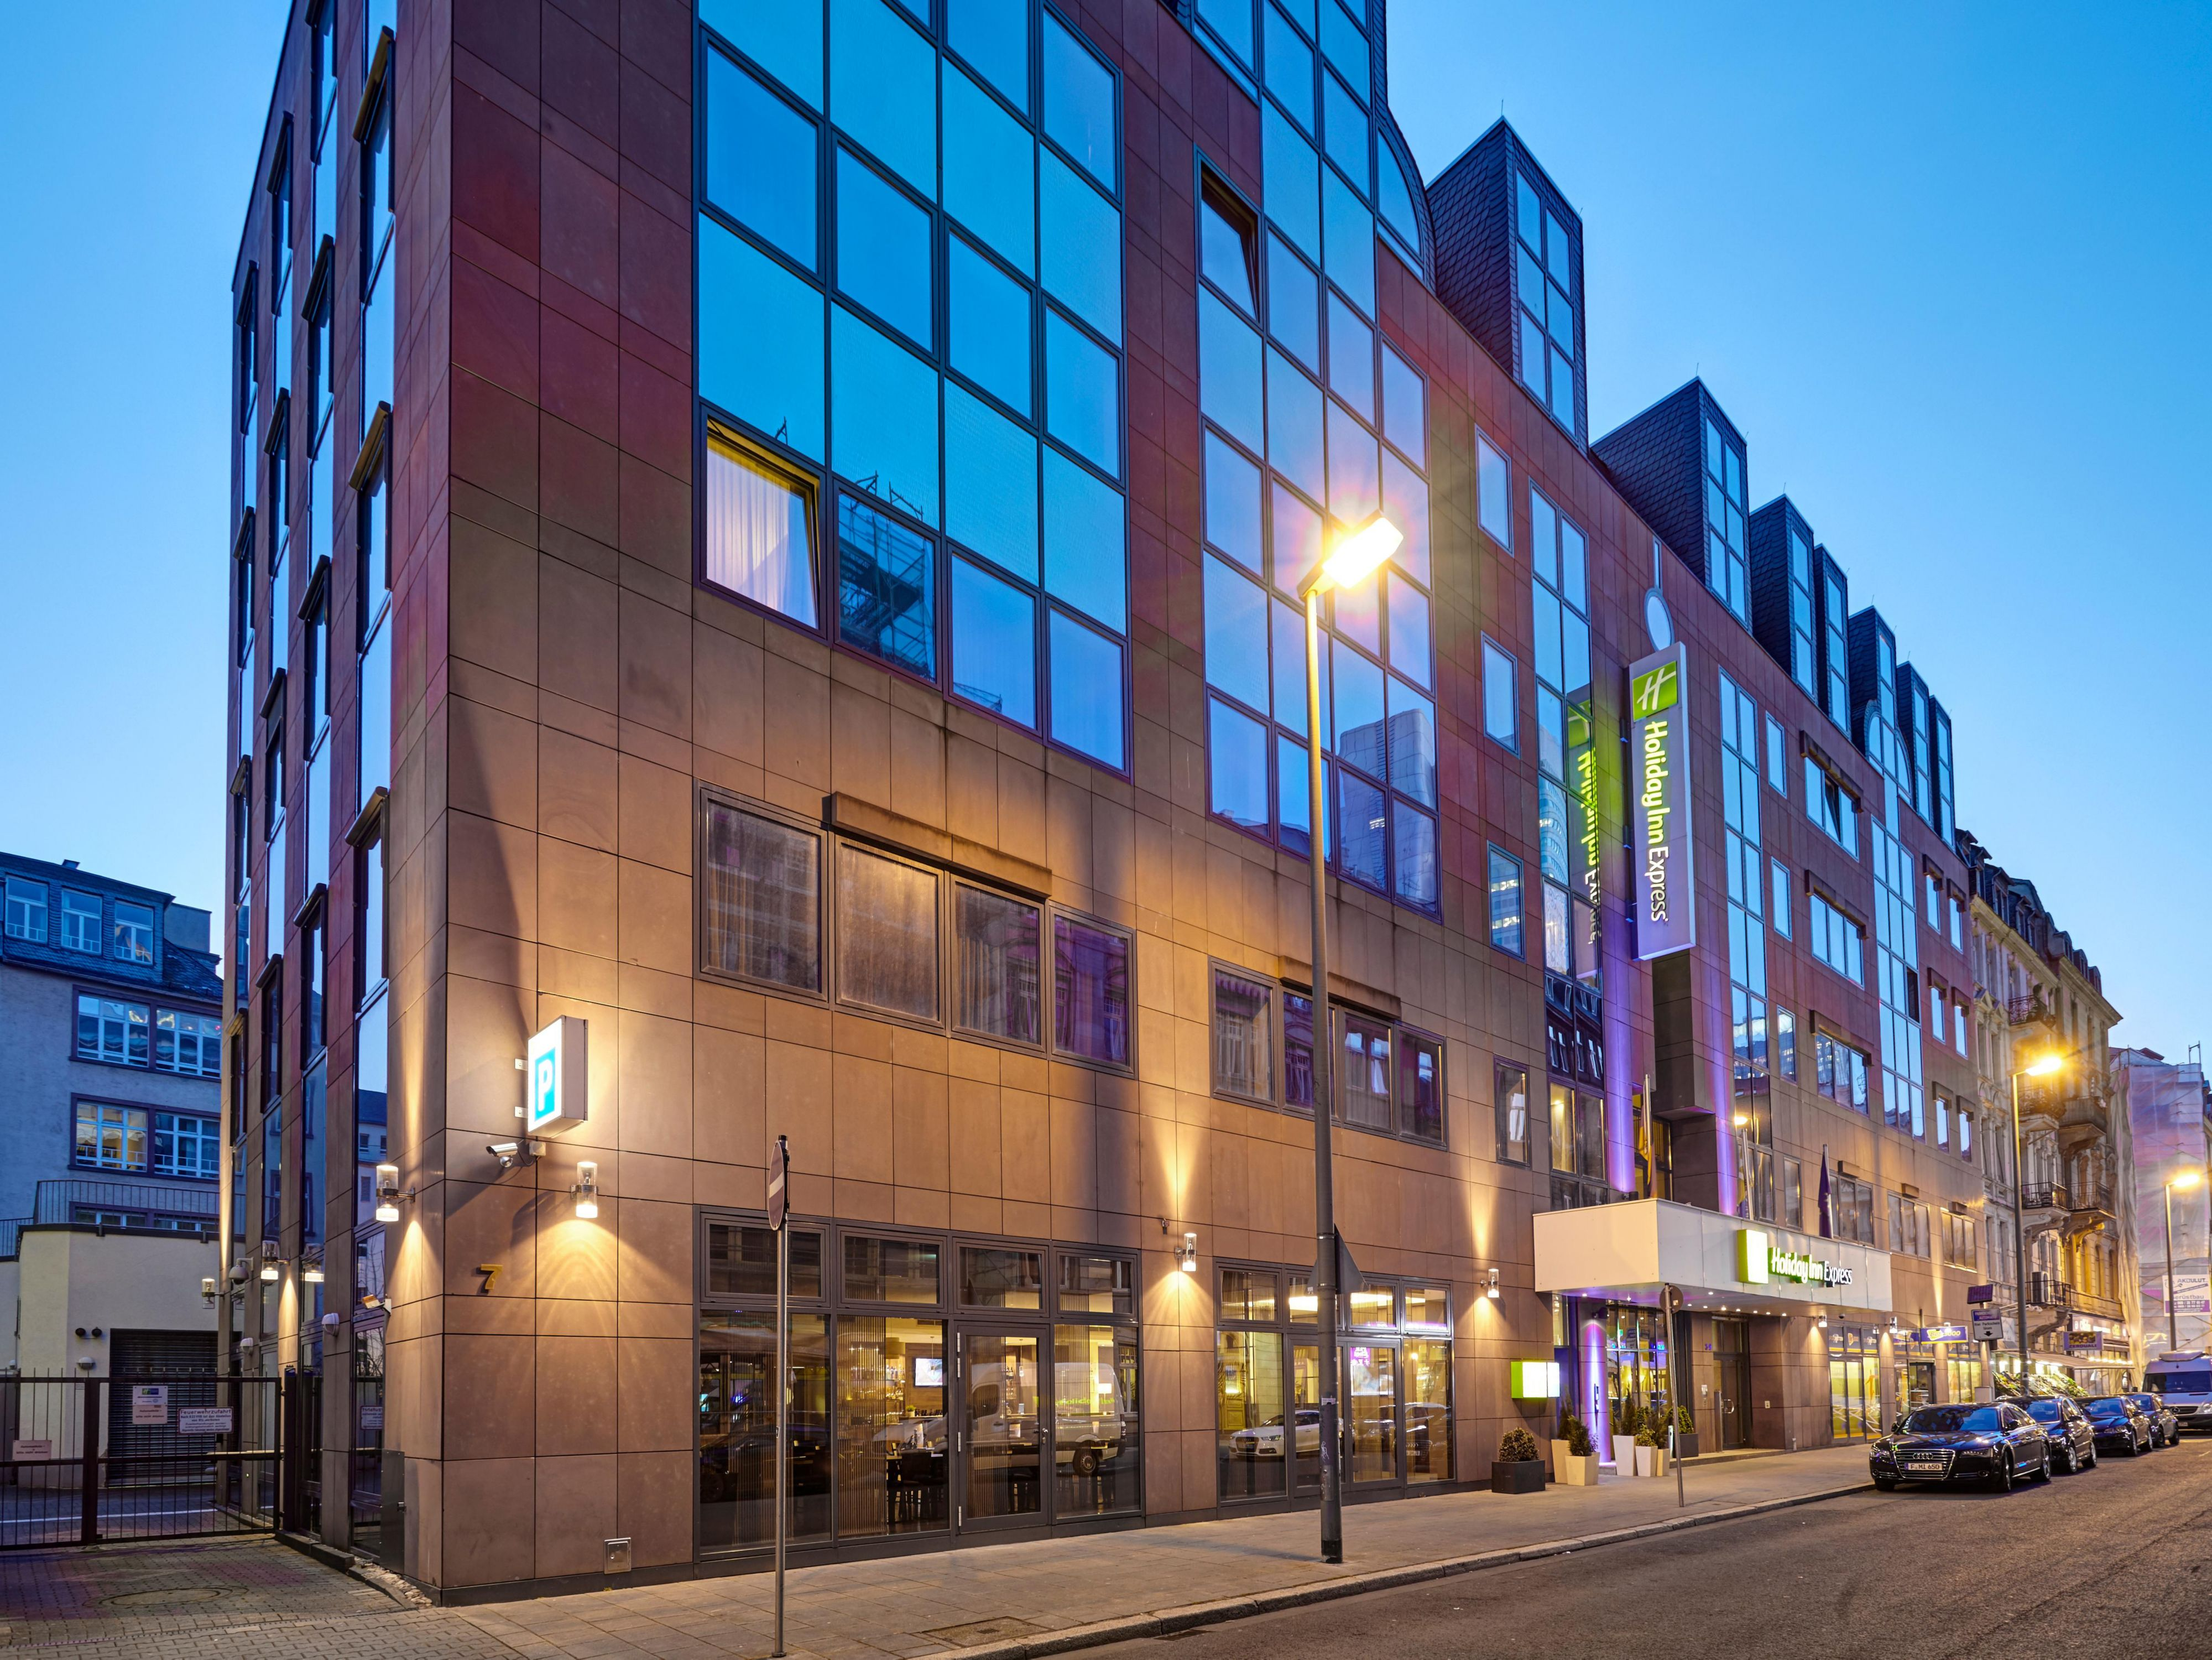 Hilton Frankfurt Airport Hotel - TripAdvisor